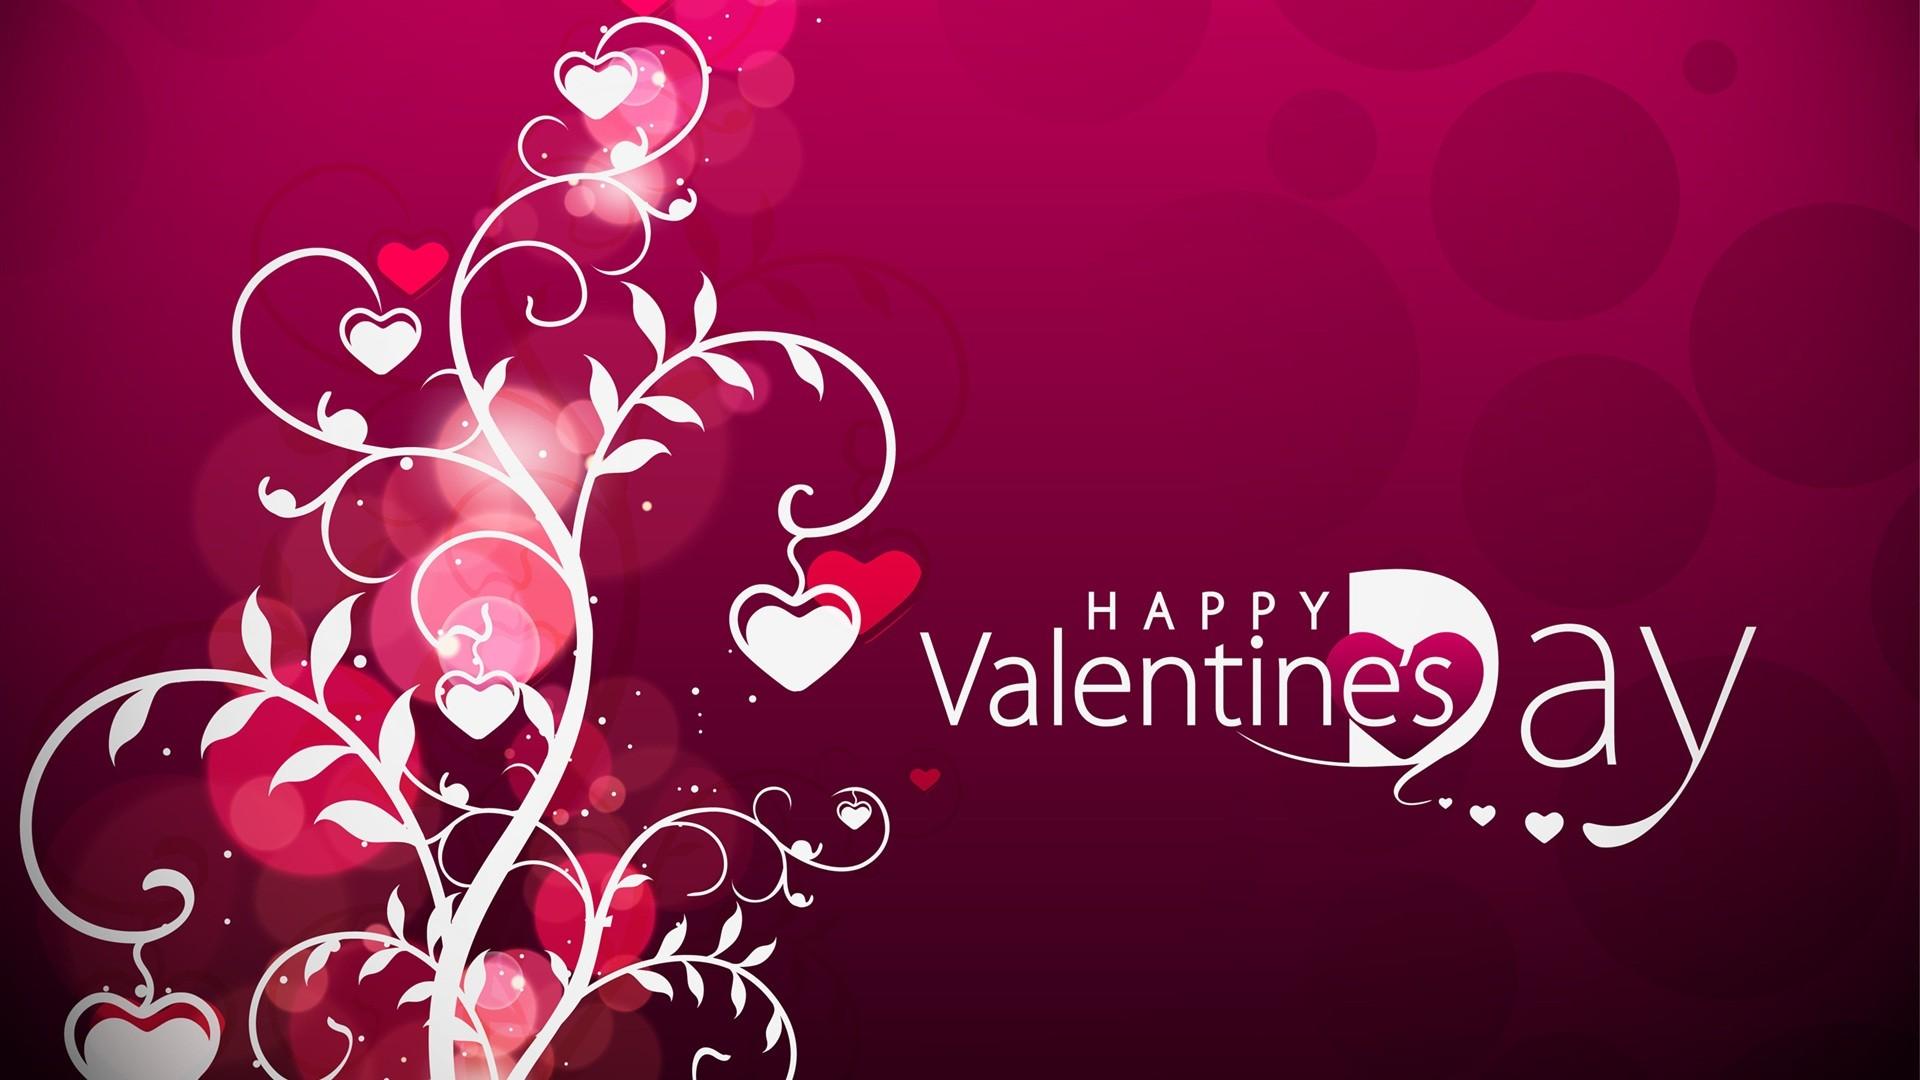 Happy-Valentines-Day-Pictures-3